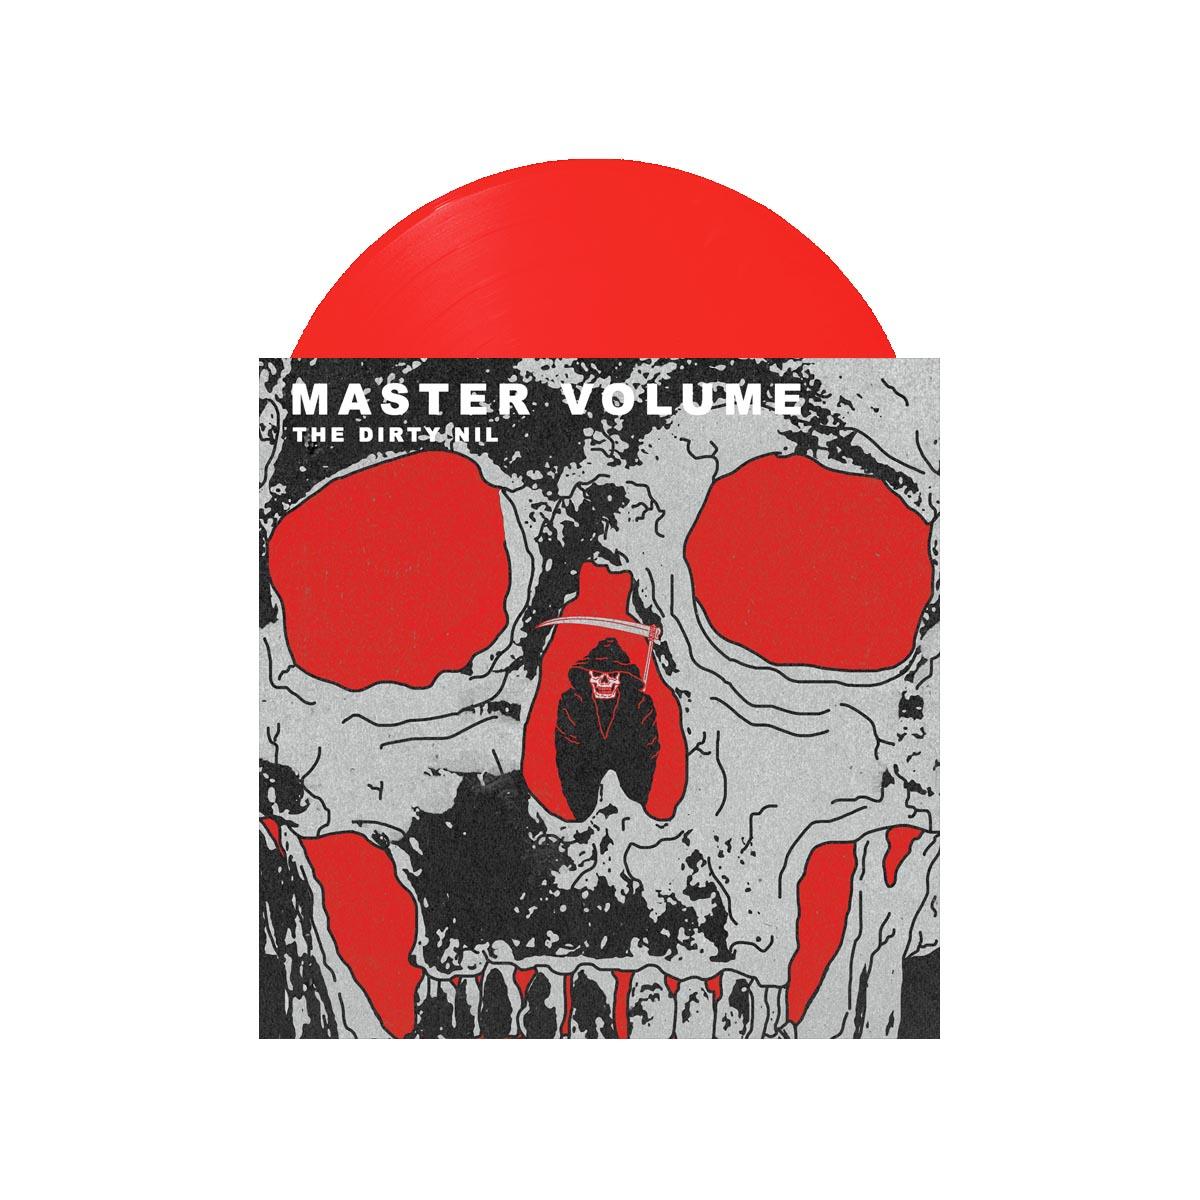 Master Volume Red Vinyl LP - The Dirty Nil